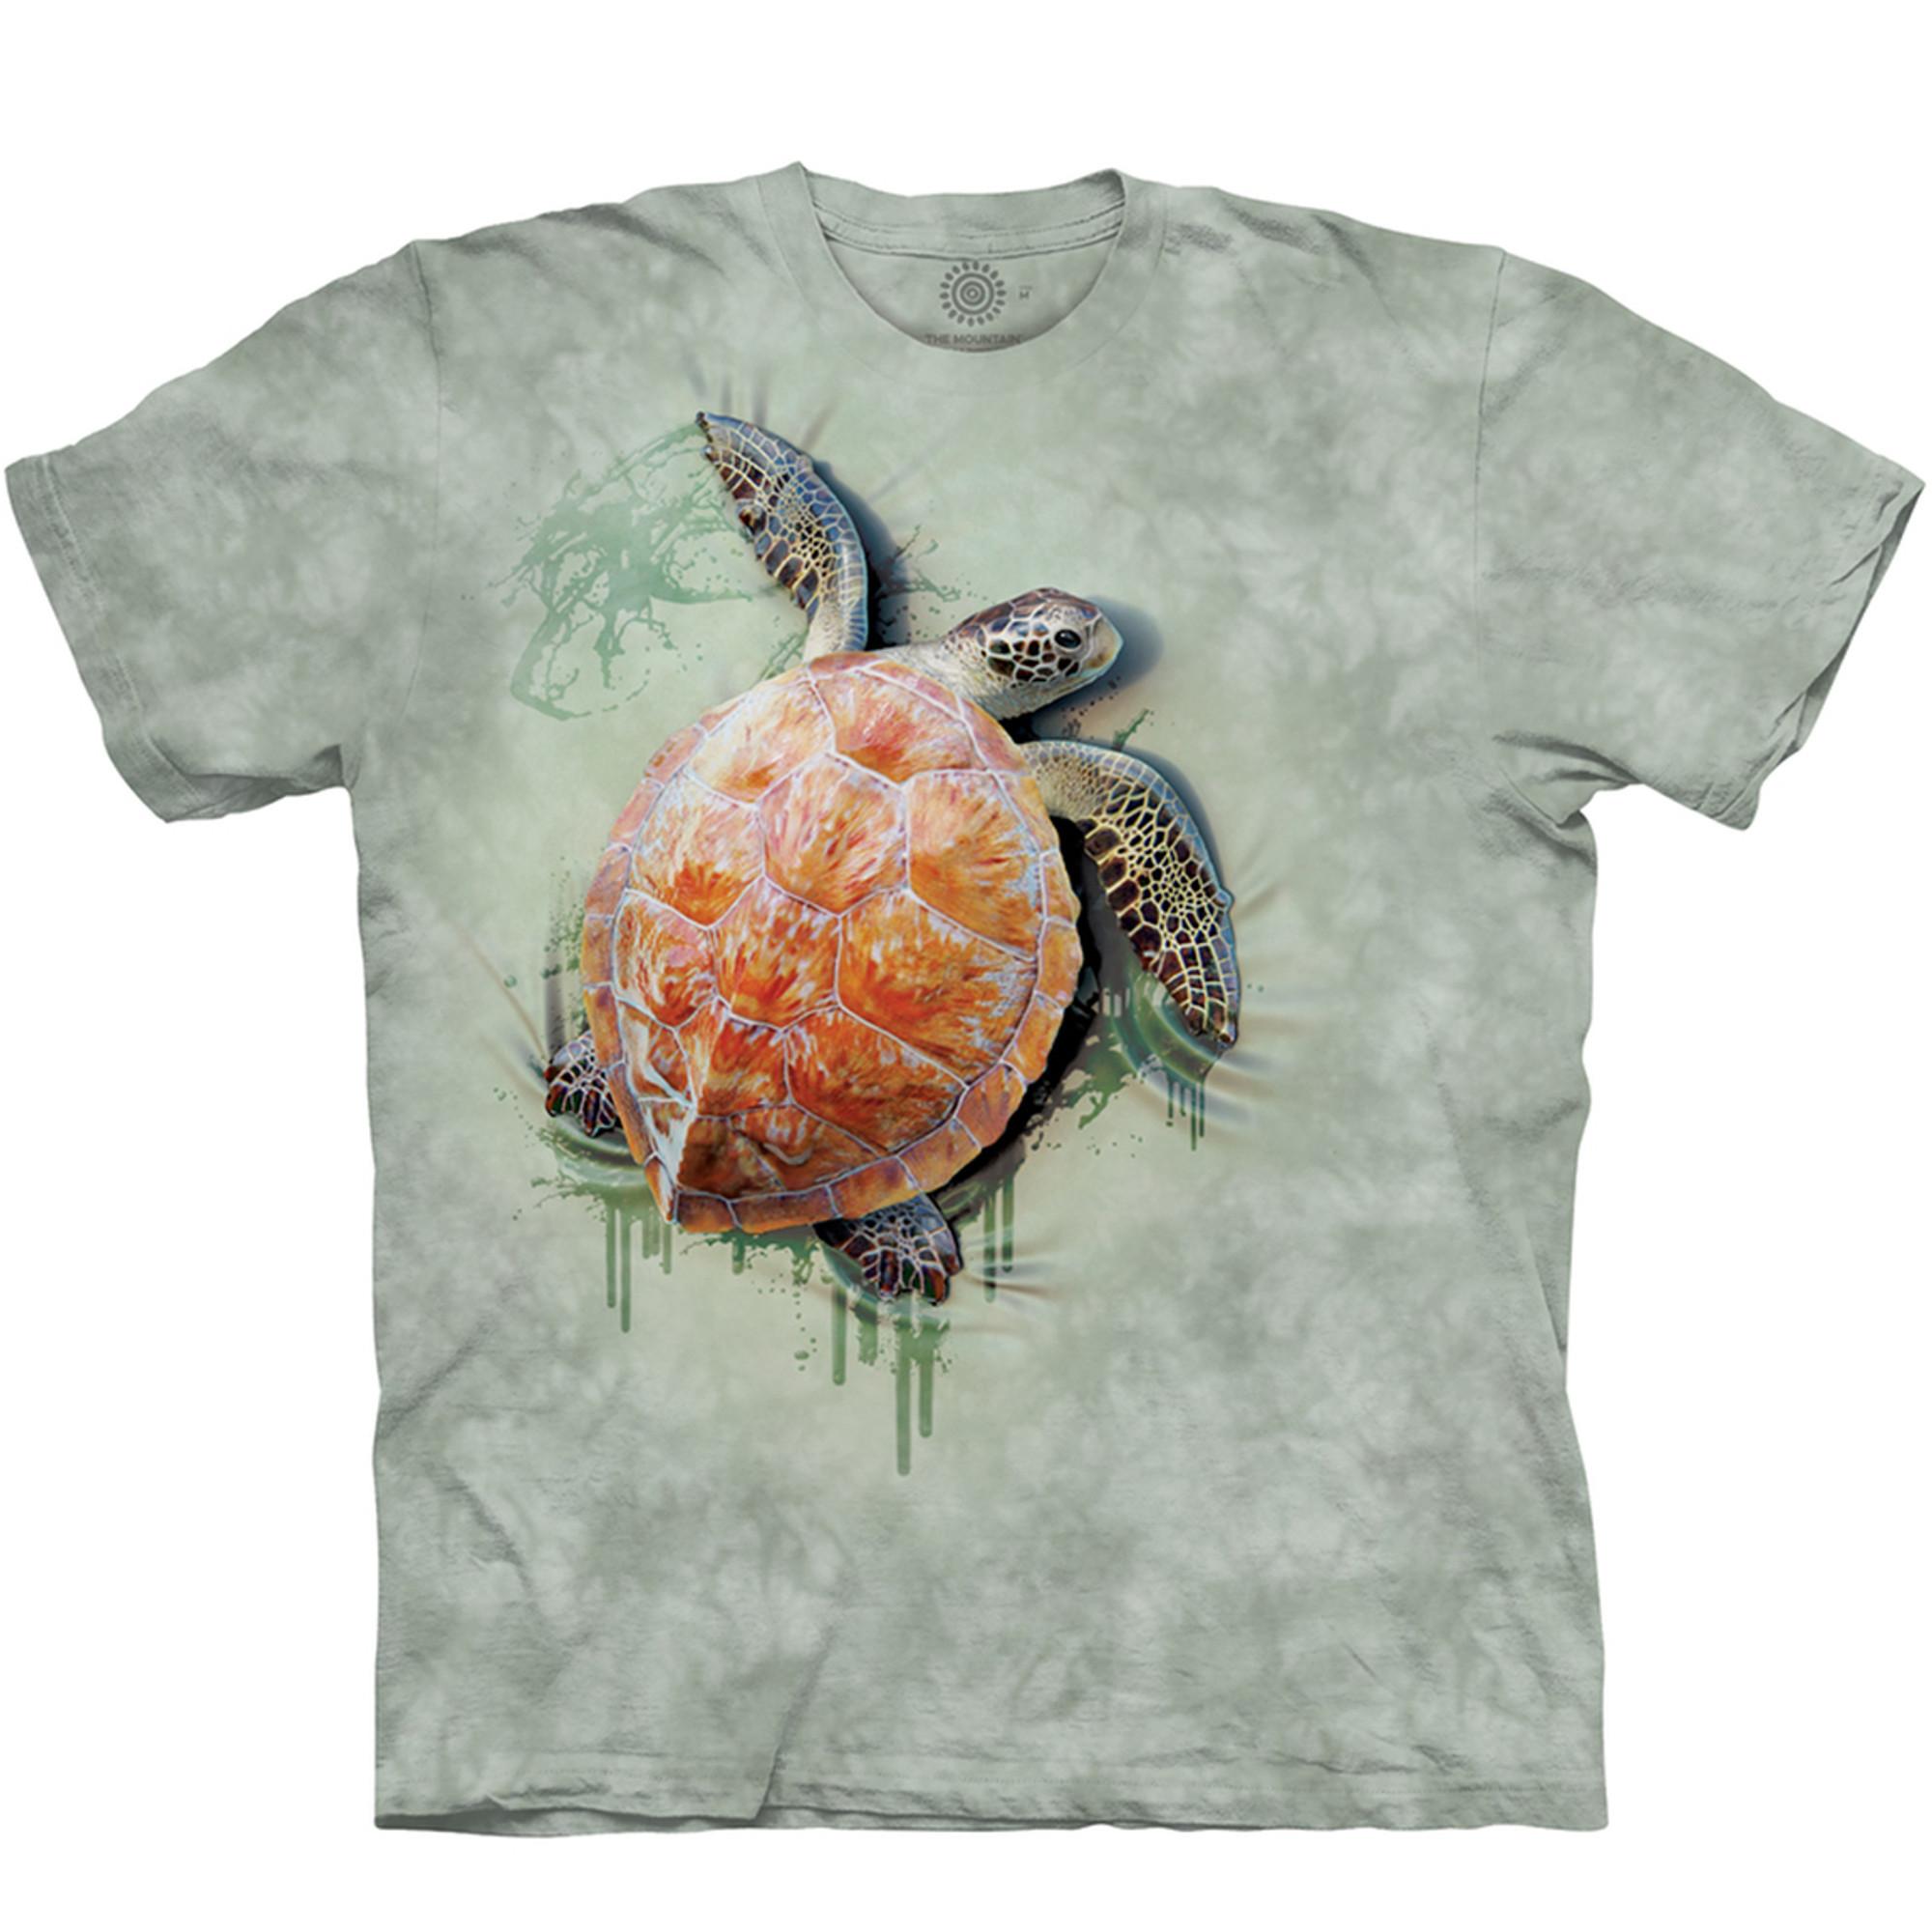 Cougar Beach Unisex Cotton T-Shirt